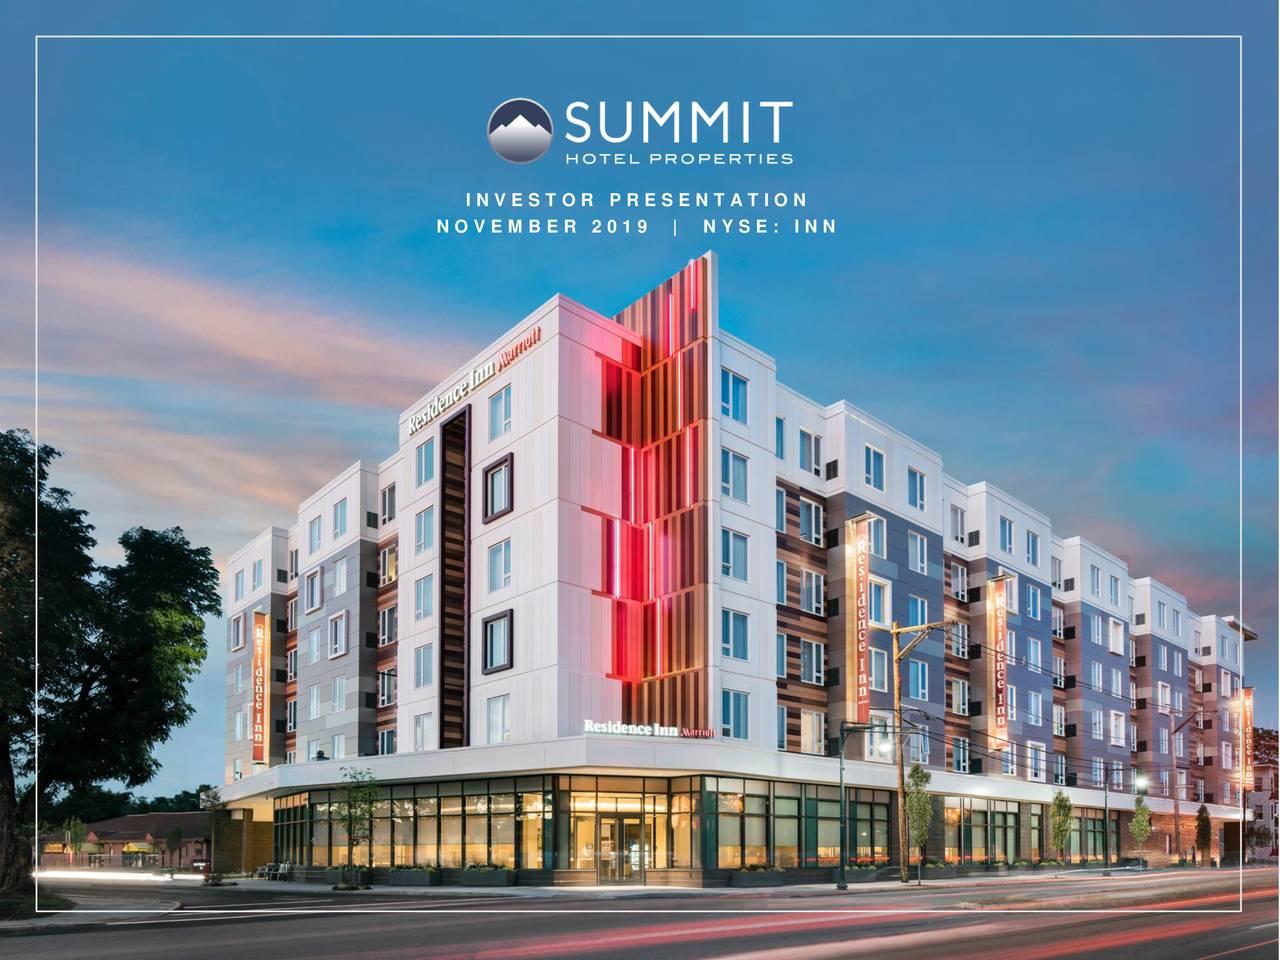 Summit Hotel Properties (INN) Investor Presentation - Slideshow - Summit Hotel Properties, Inc. (NYSE:INN) | Seeking Alpha